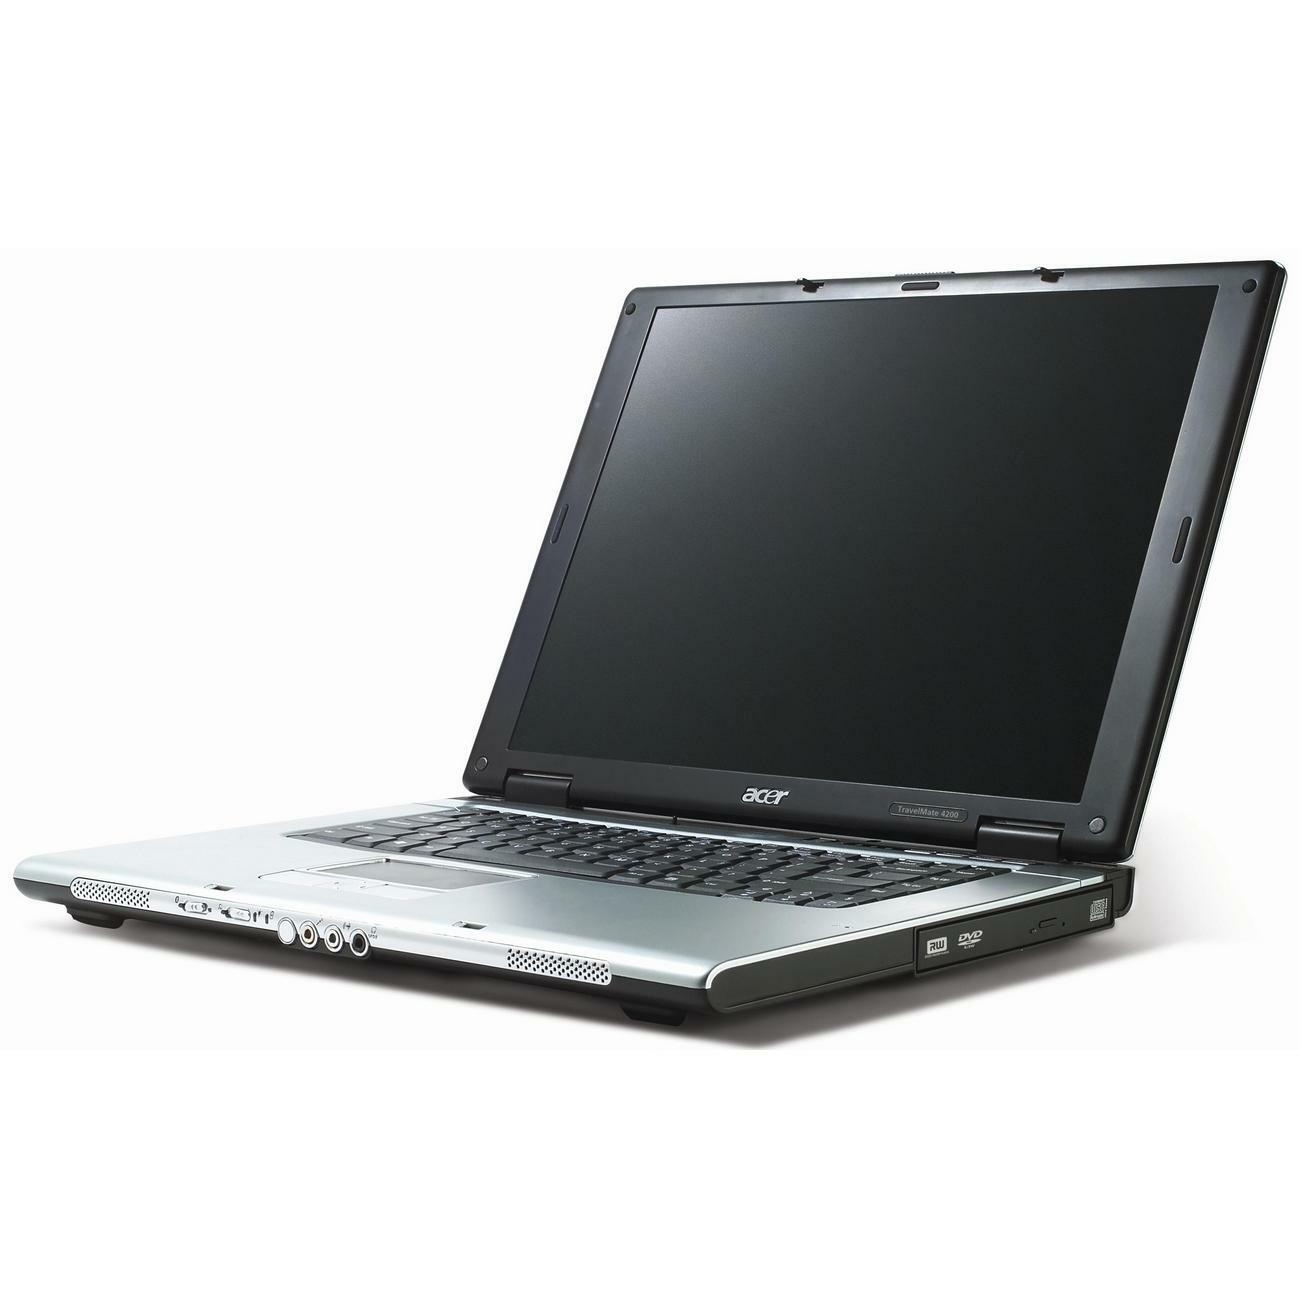 Acer TravelMate 4200 Modem Drivers Mac